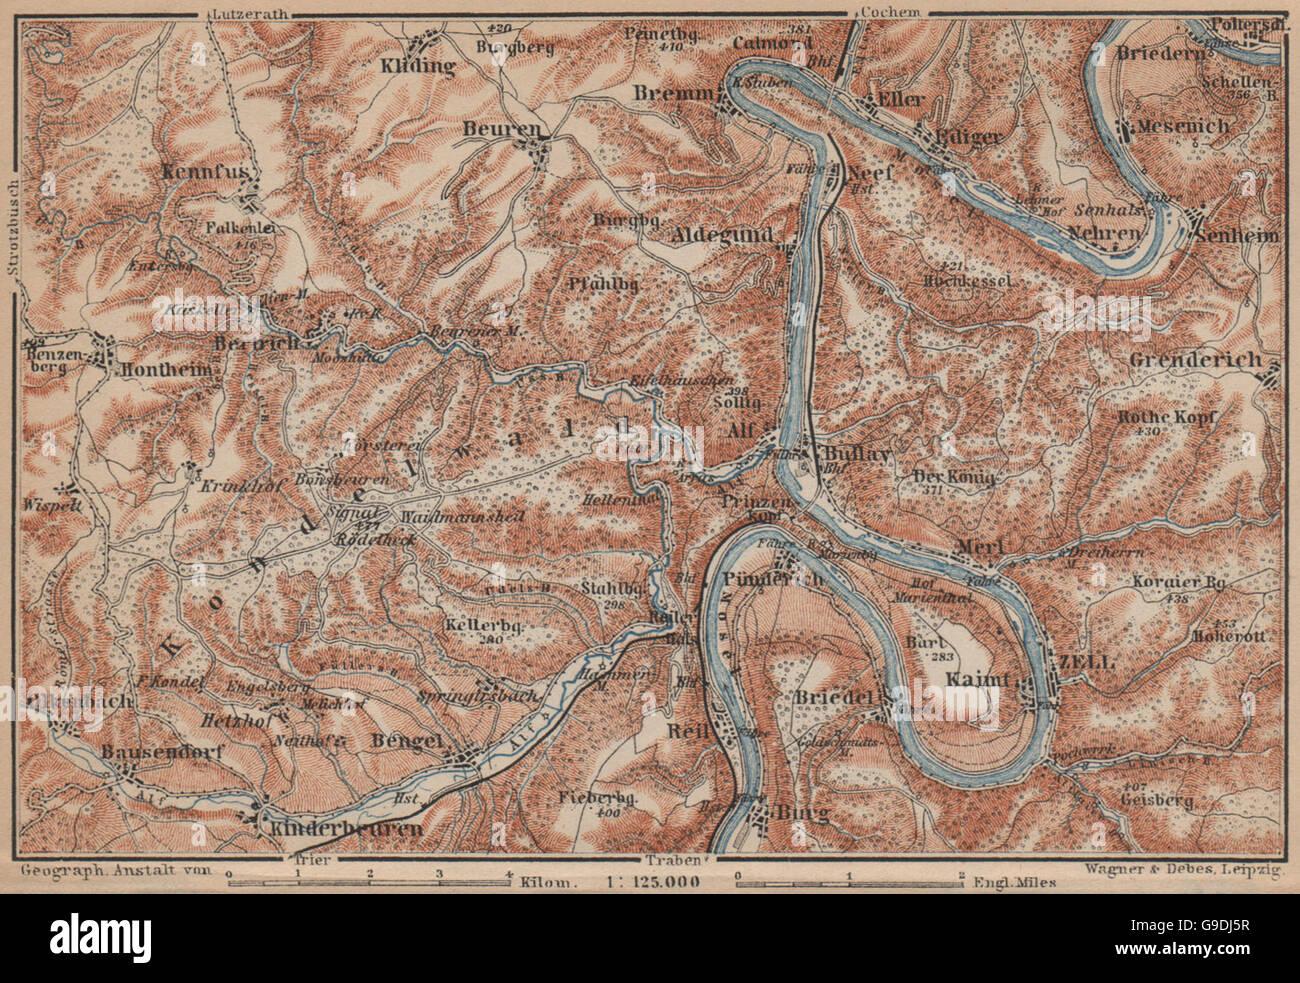 Karte Eifel.Mosel Zeller Hamm Alf Kondelwald Mosel Eifel Rheinland Pfalz